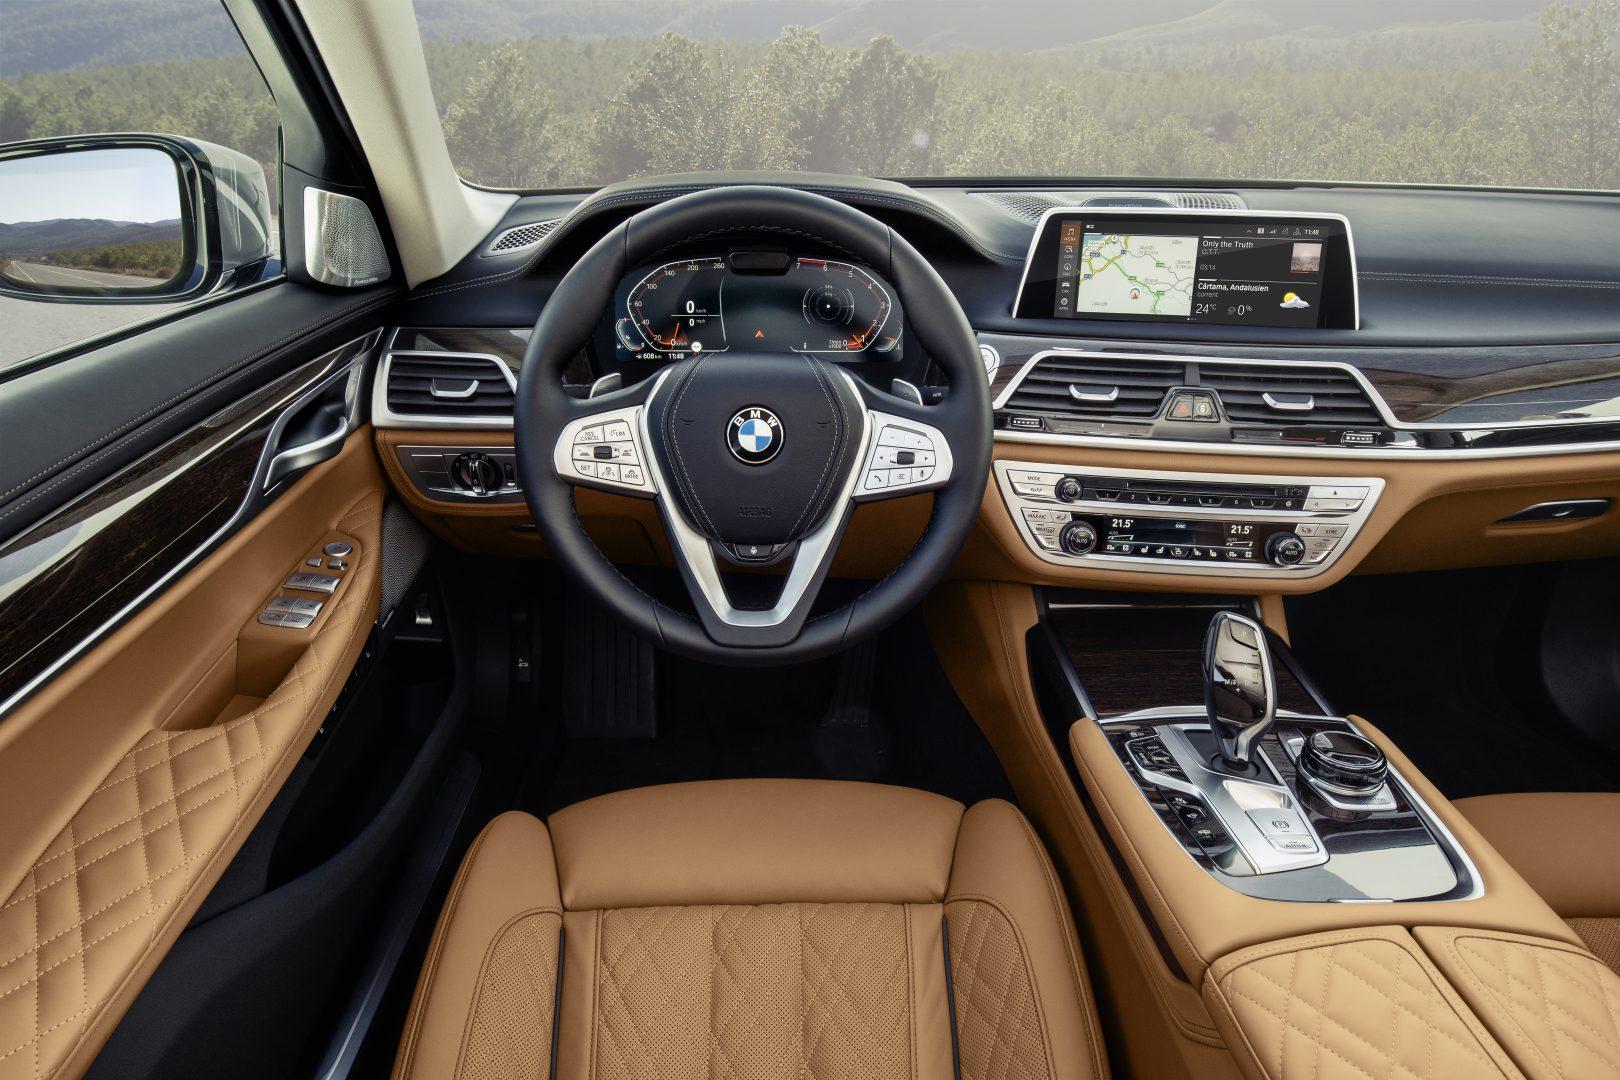 BMW_7_podlahanews_interior